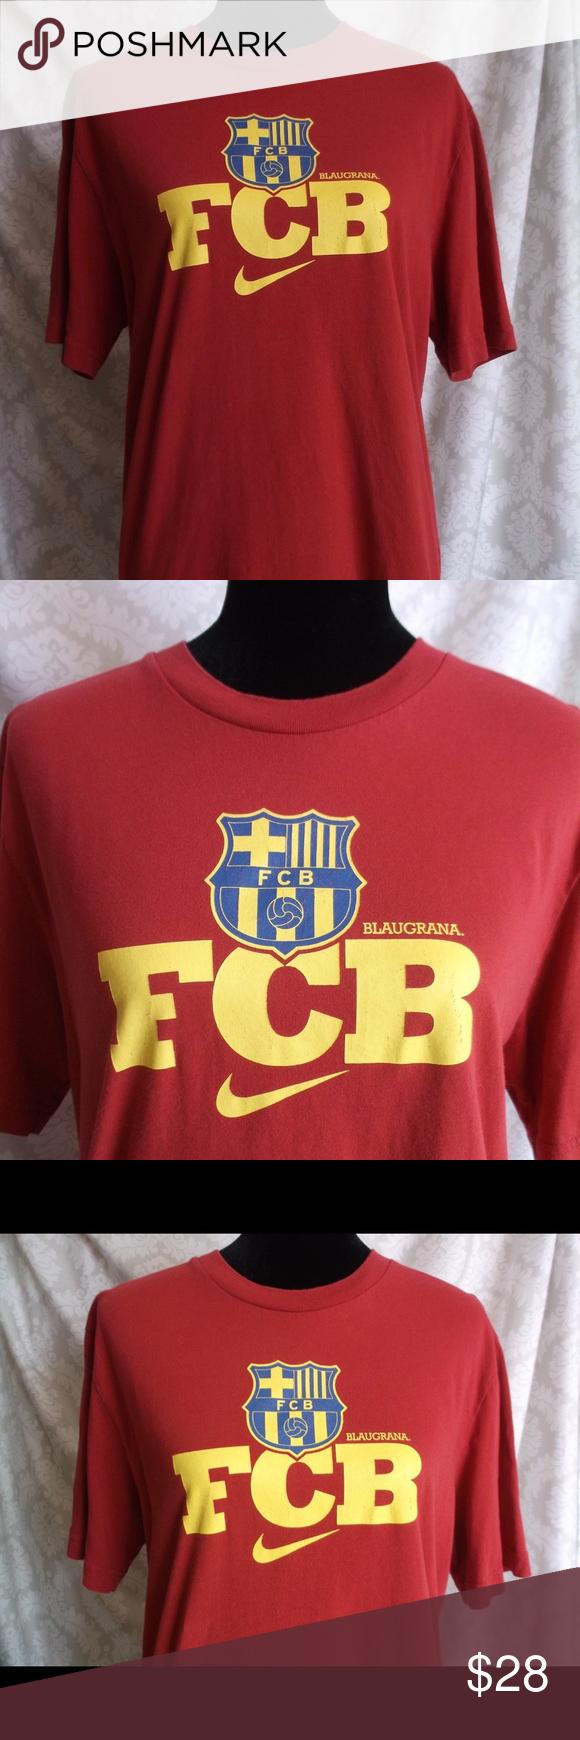 f64a110bbc76 Nike Futbol Barcelona FCB team T-Shirt L Nike Futbol Barcelona FCB team  T-Shirt L Nike line of shirts for Football Club Barcelona FC Barcelona also  known as ...